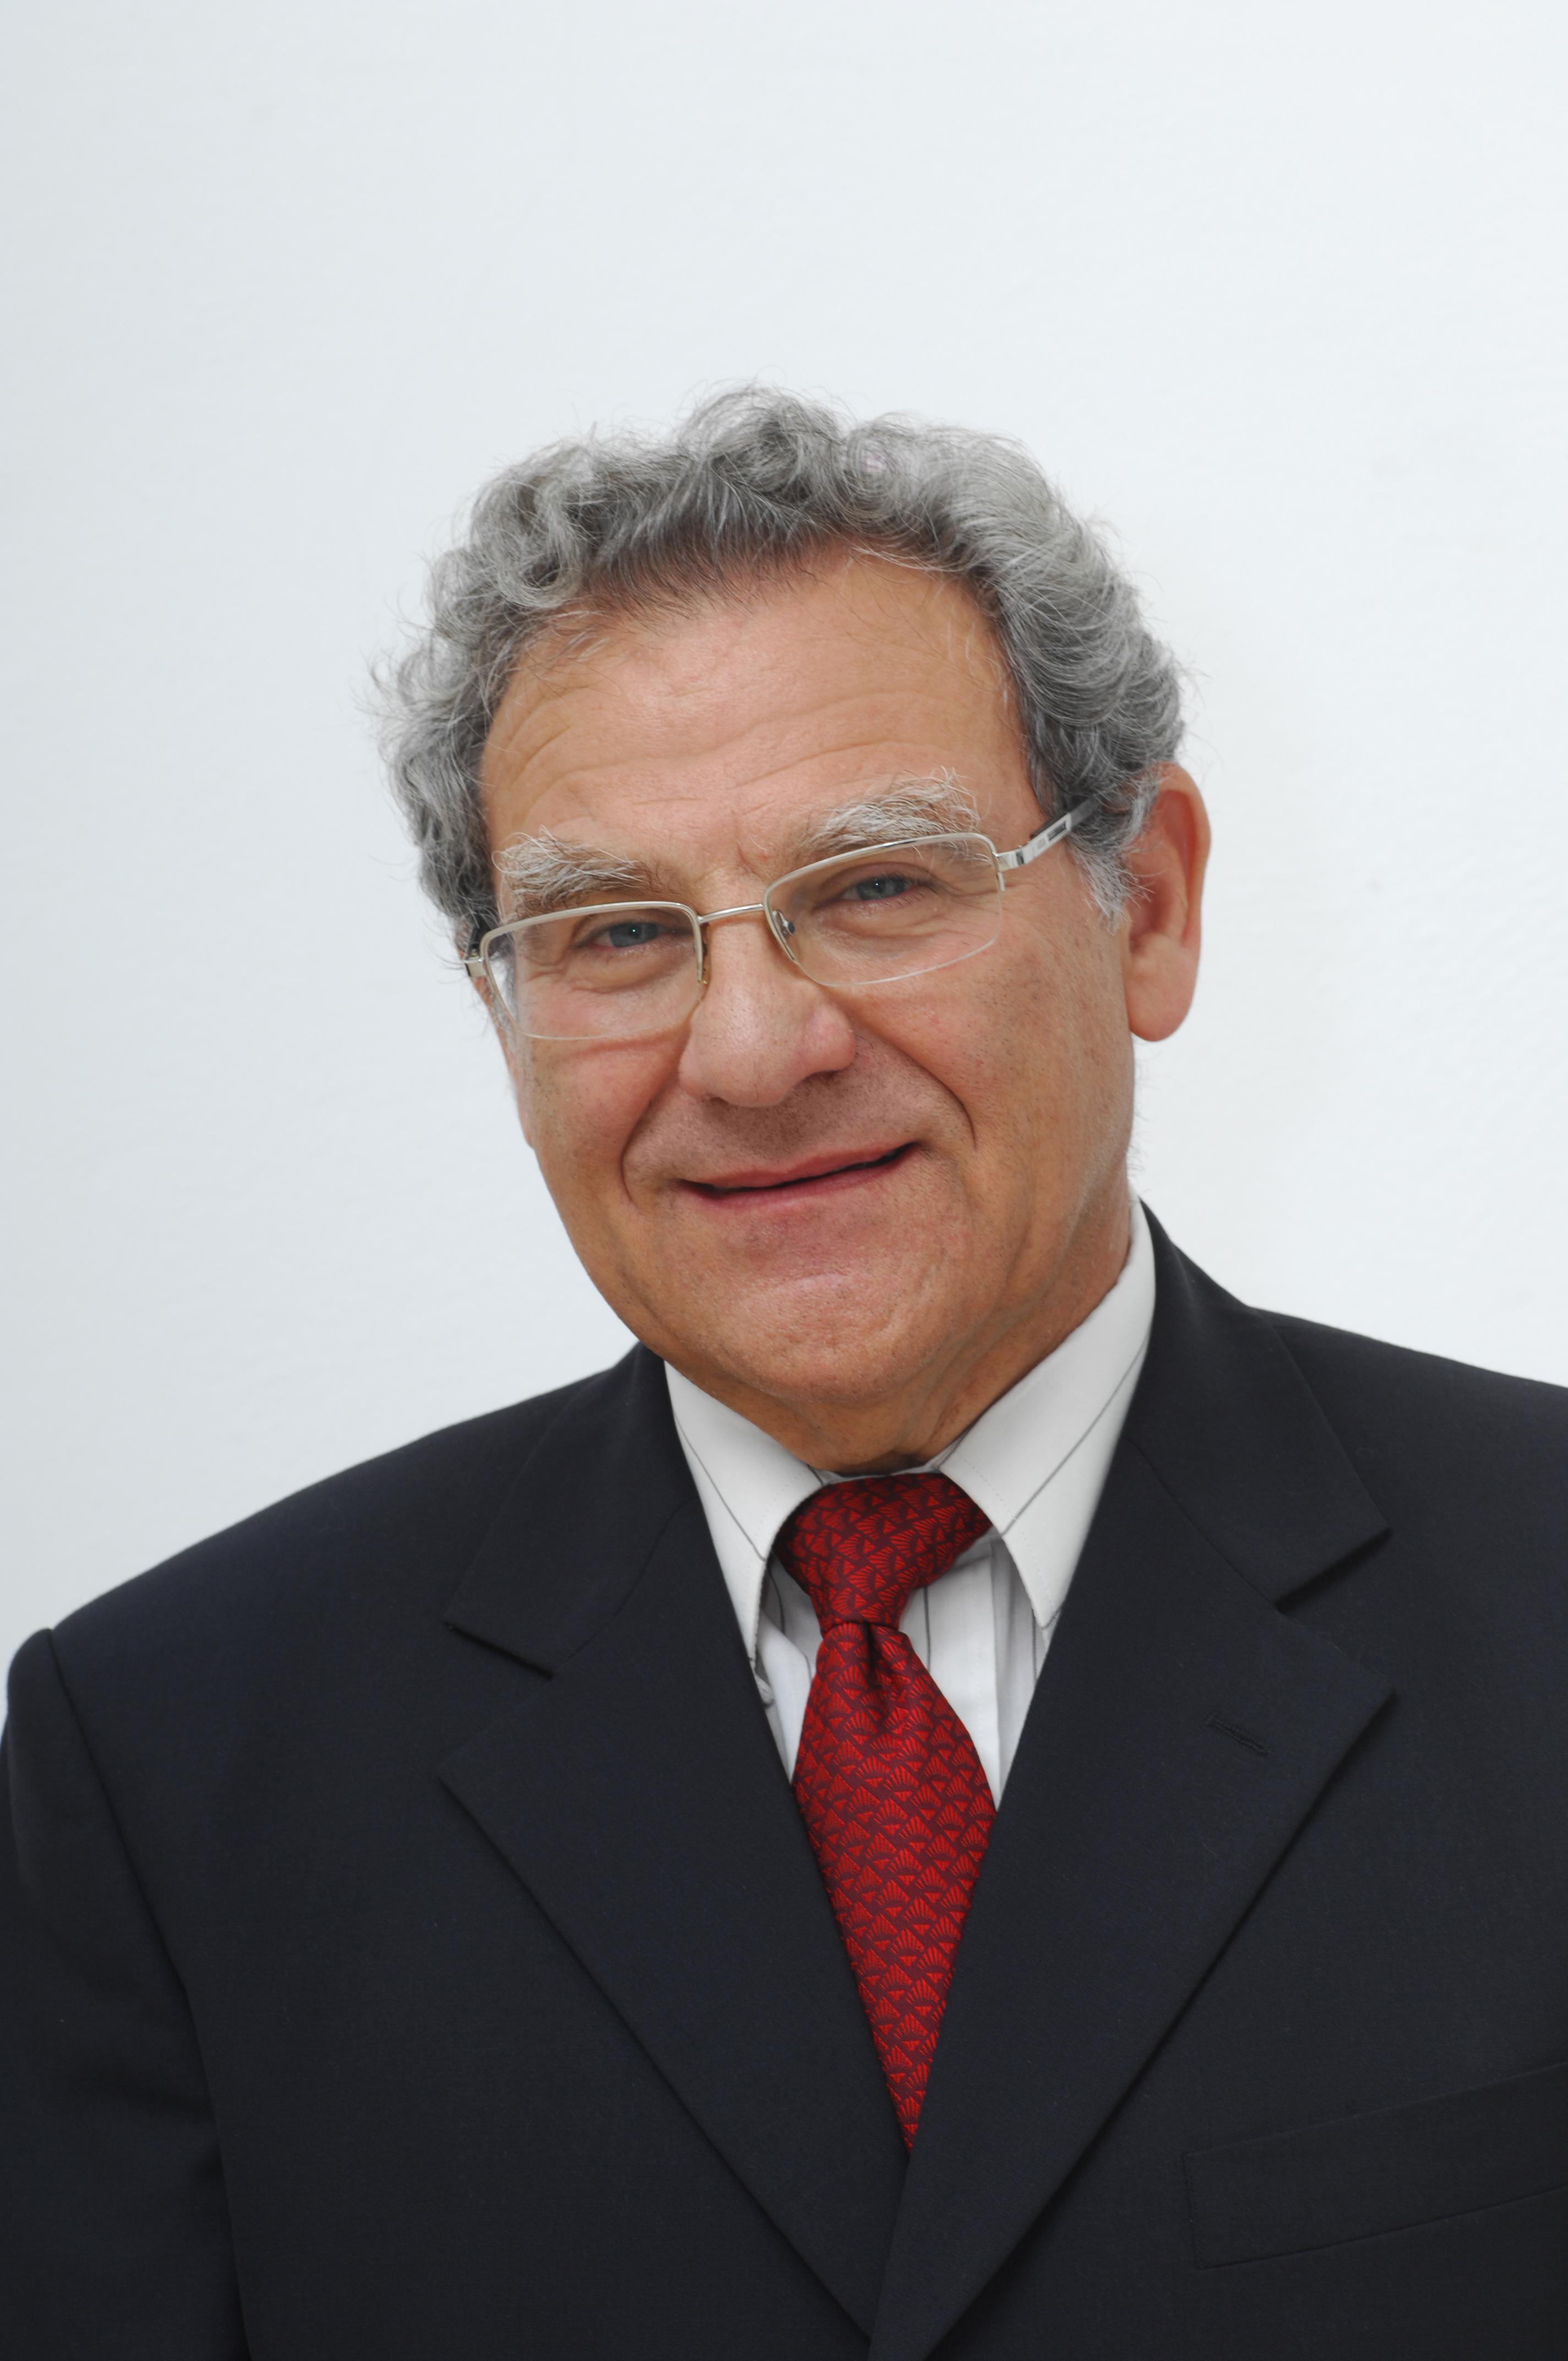 IBNA/ Interview with Efraim Inbar, Professor of Political Science – Director of the Center of Strategic Studies Begin Sadat (BESA)